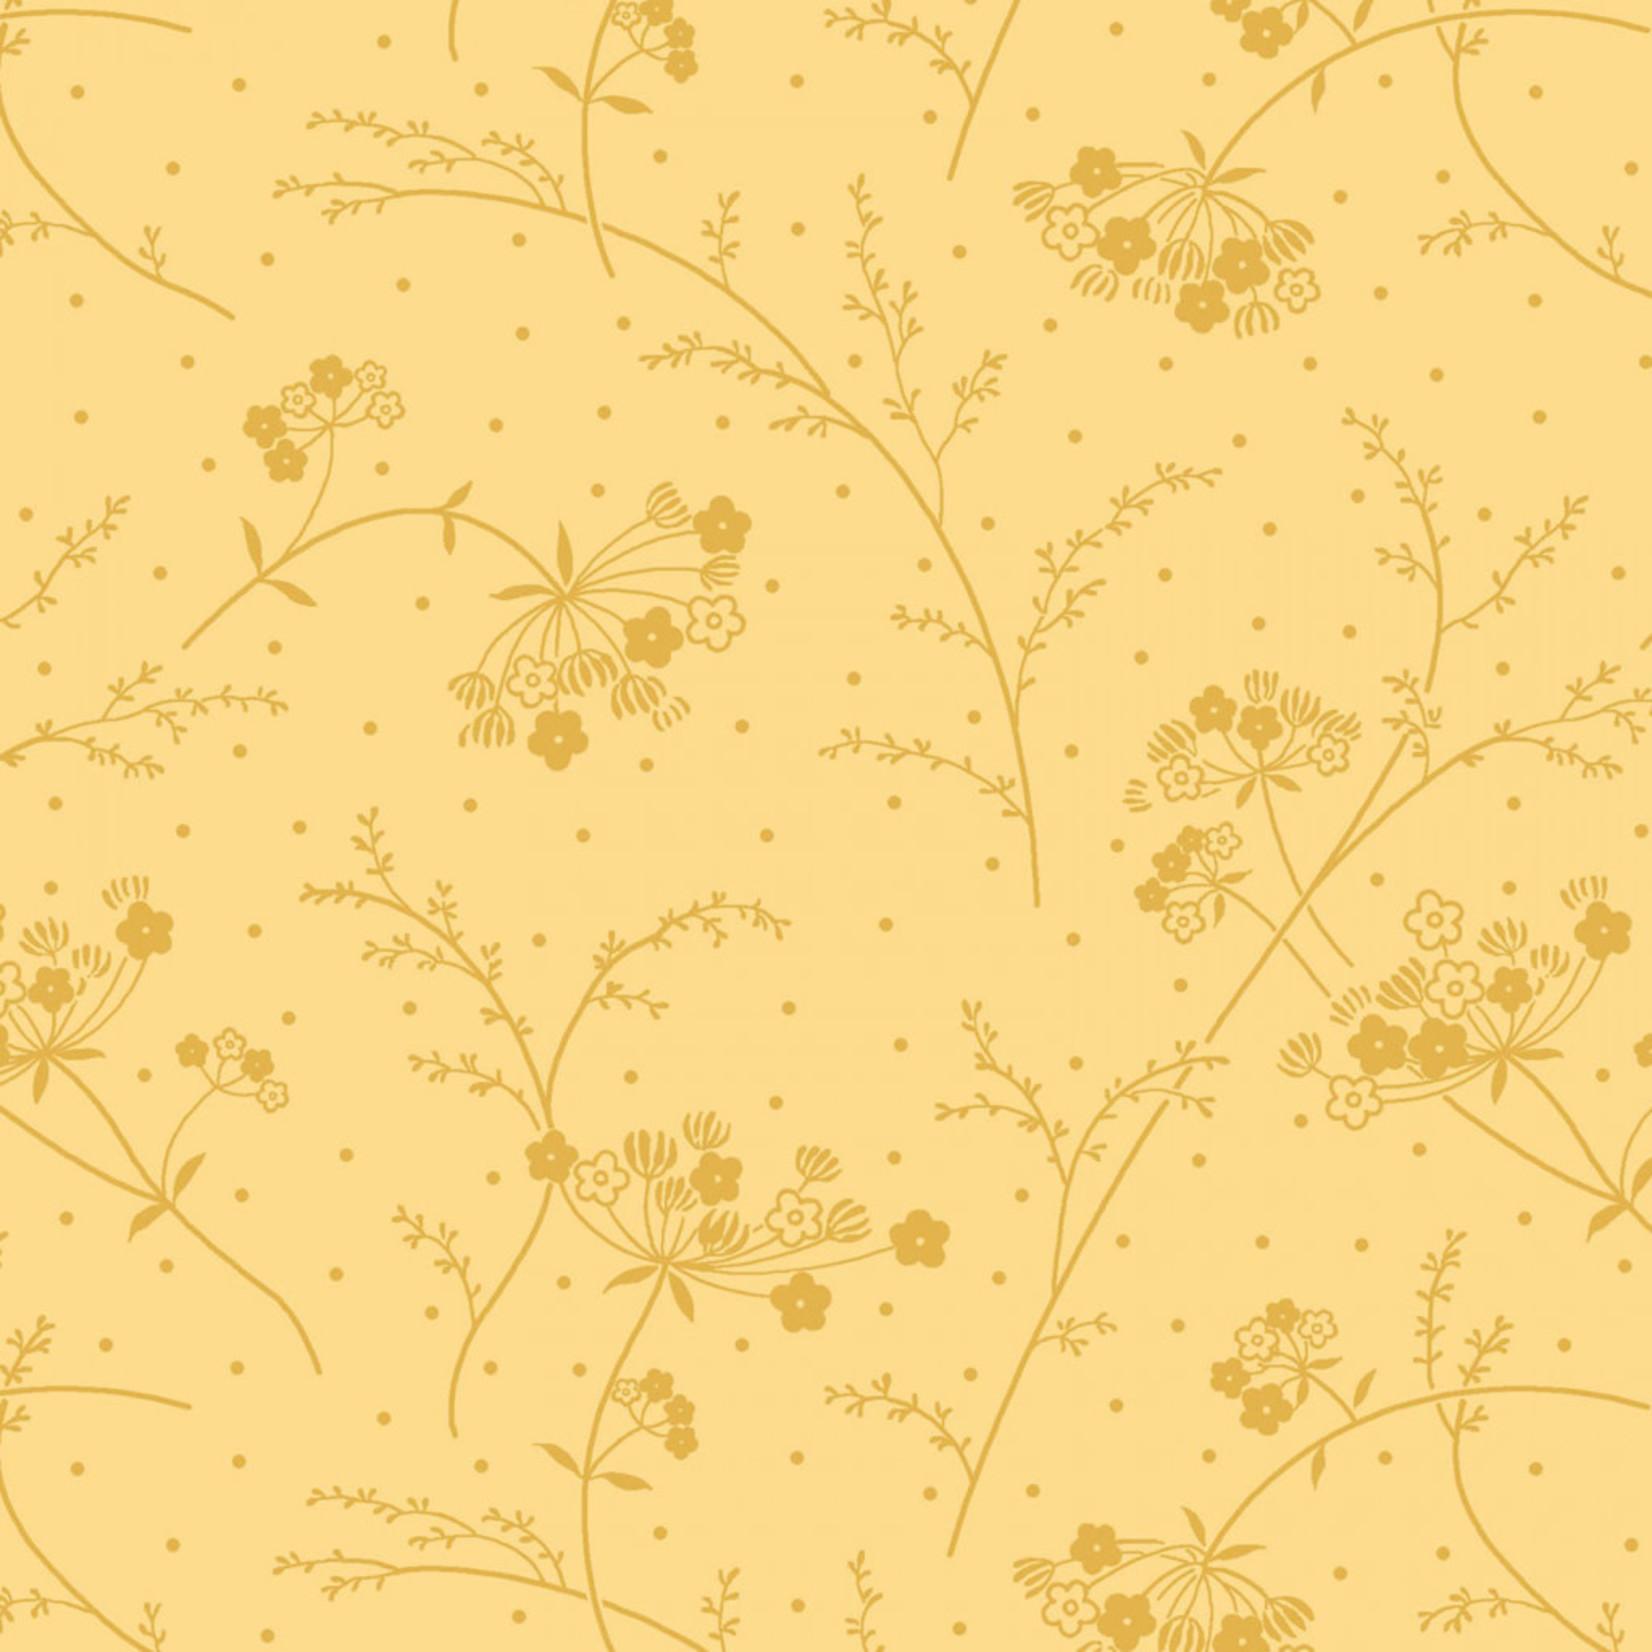 Maywood Studio Make Yourself at Home - Garden - Yellow